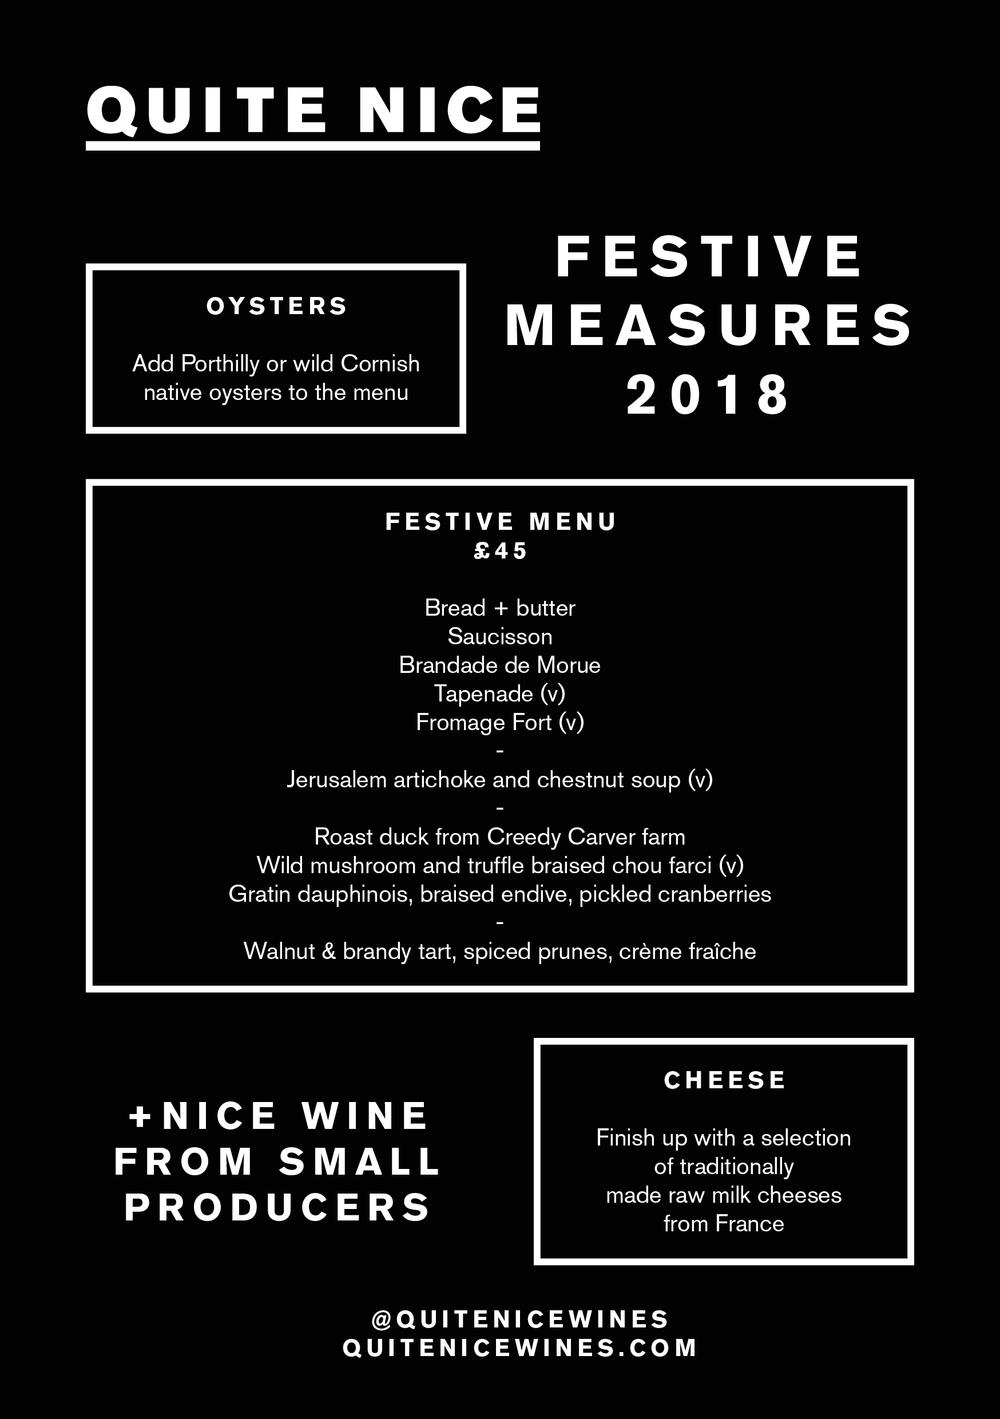 Festive Measures Final Menu.png